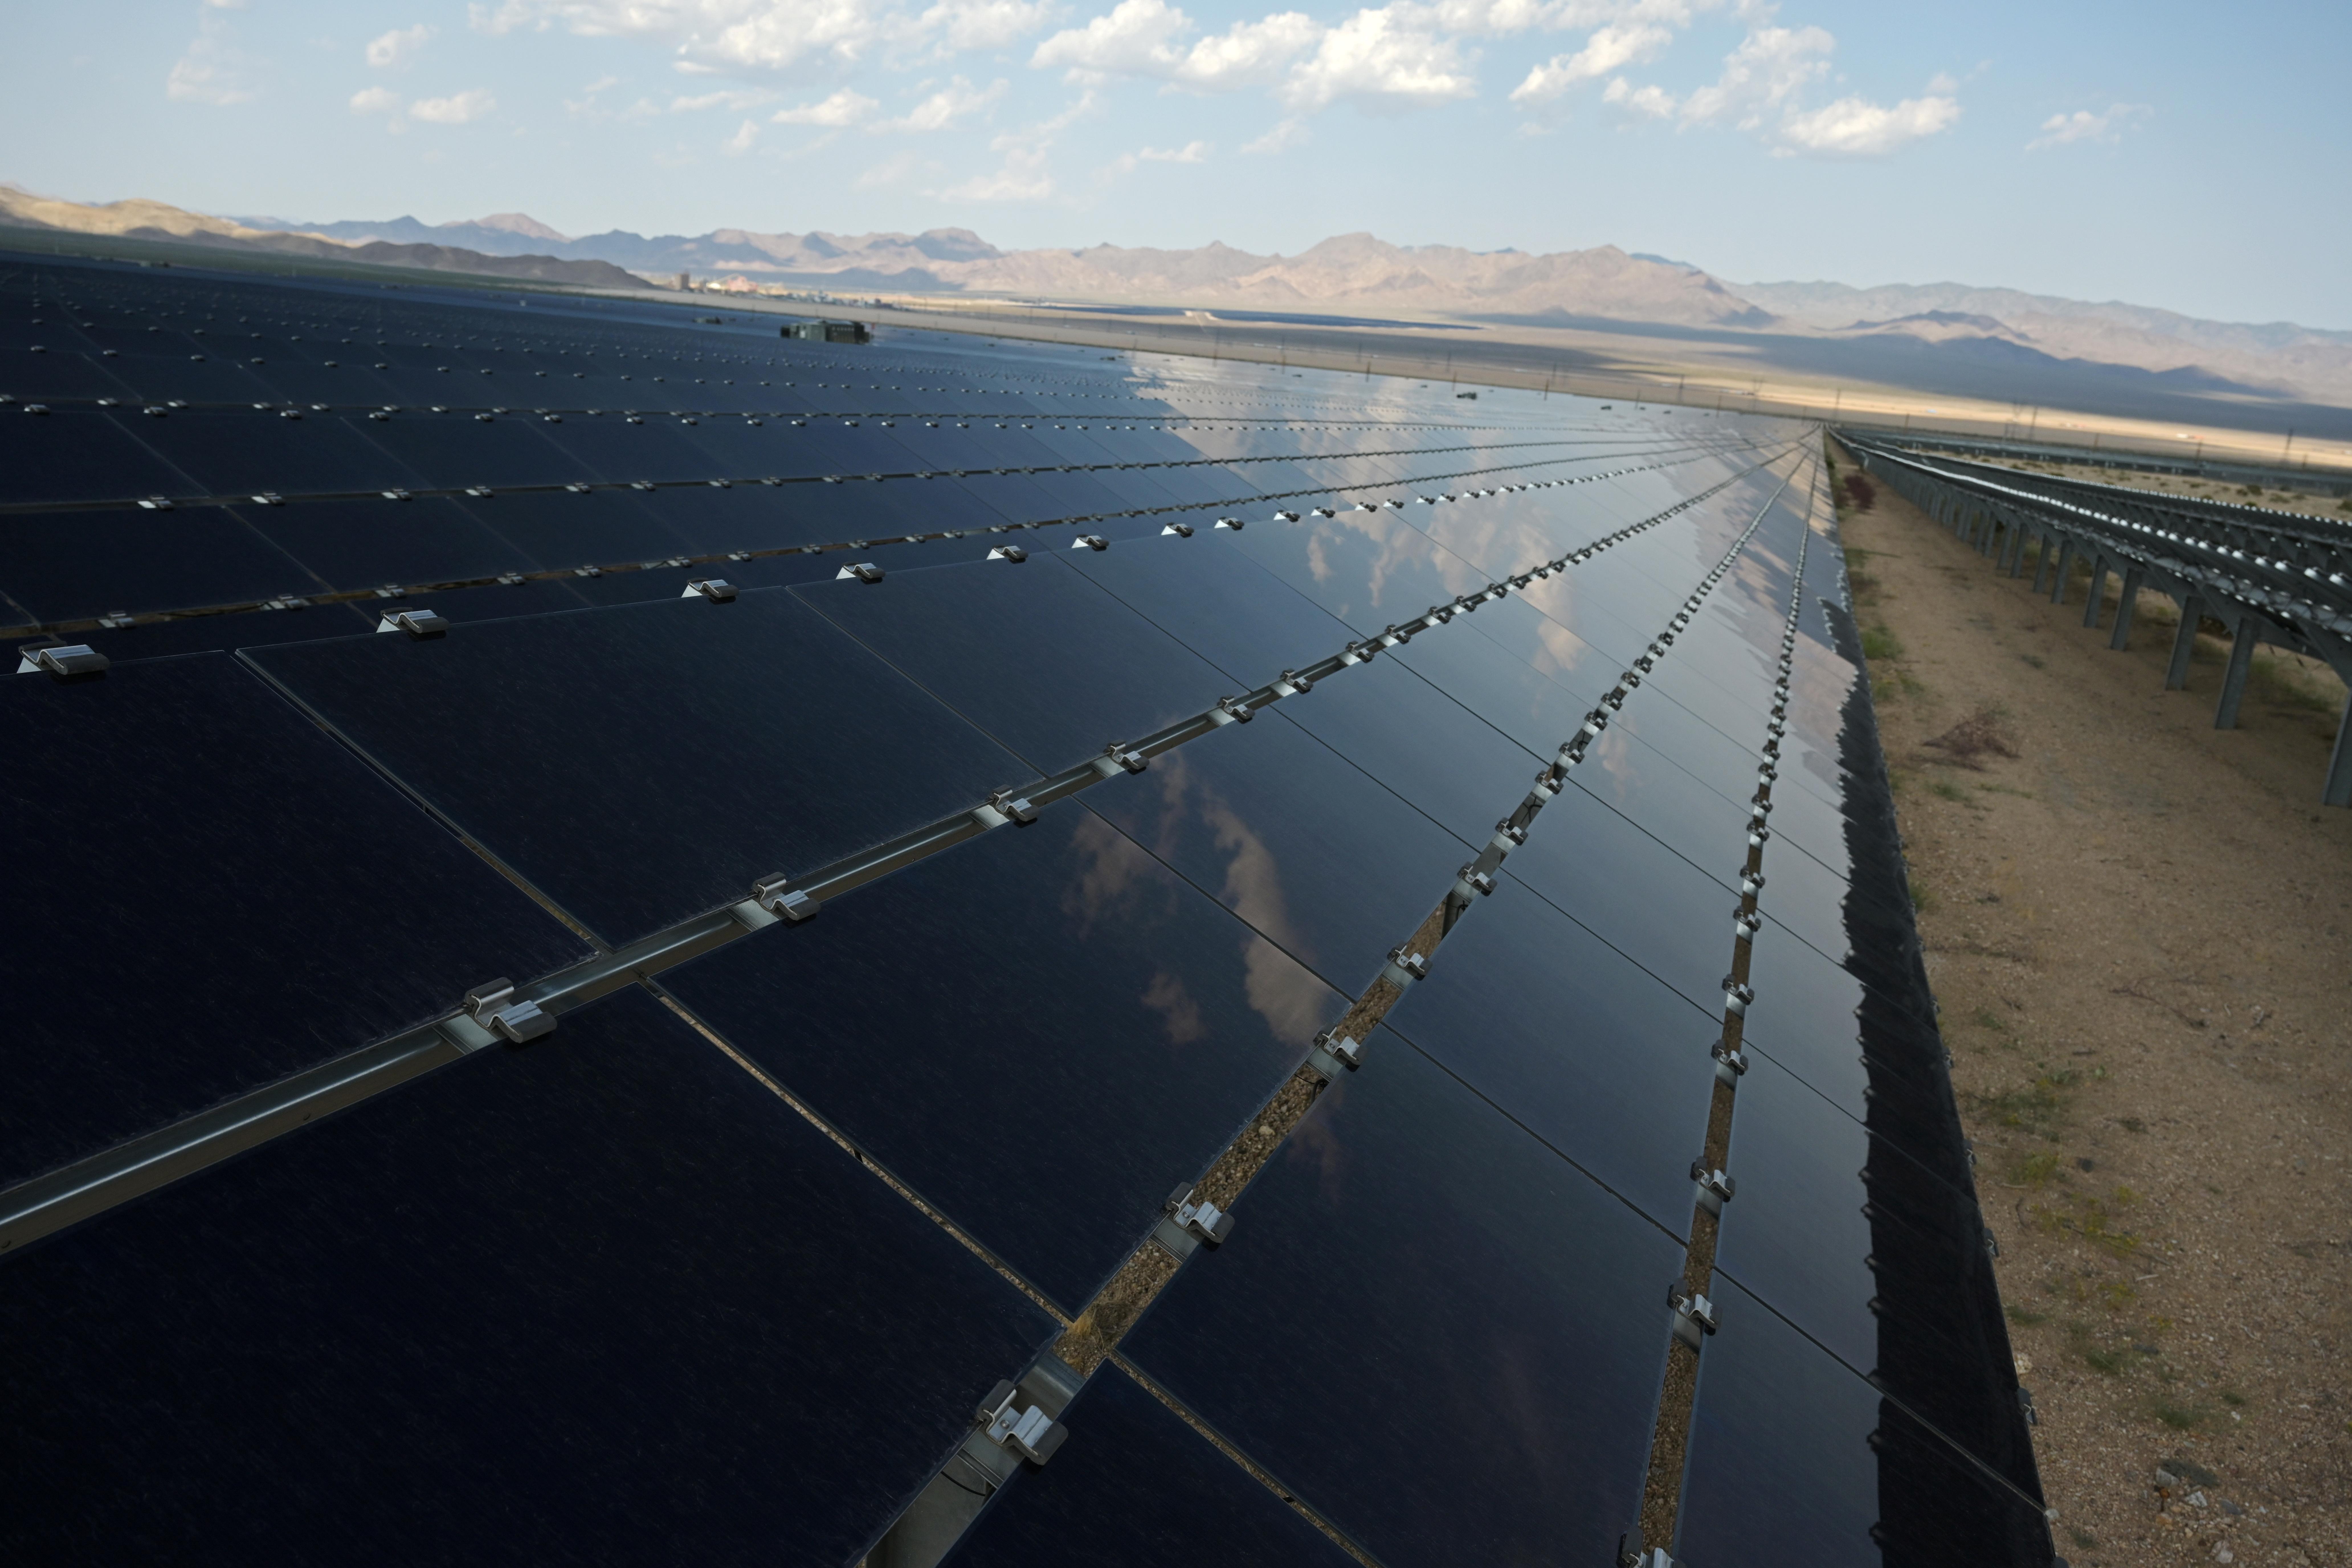 Gwelir paneli solar ym mhrosiect Desert Stateline ger Nipton, California, UD Awst 16, 2021. Llun wedi'i dynnu Awst 16, 2021. REUTERS / Bridget Bennett